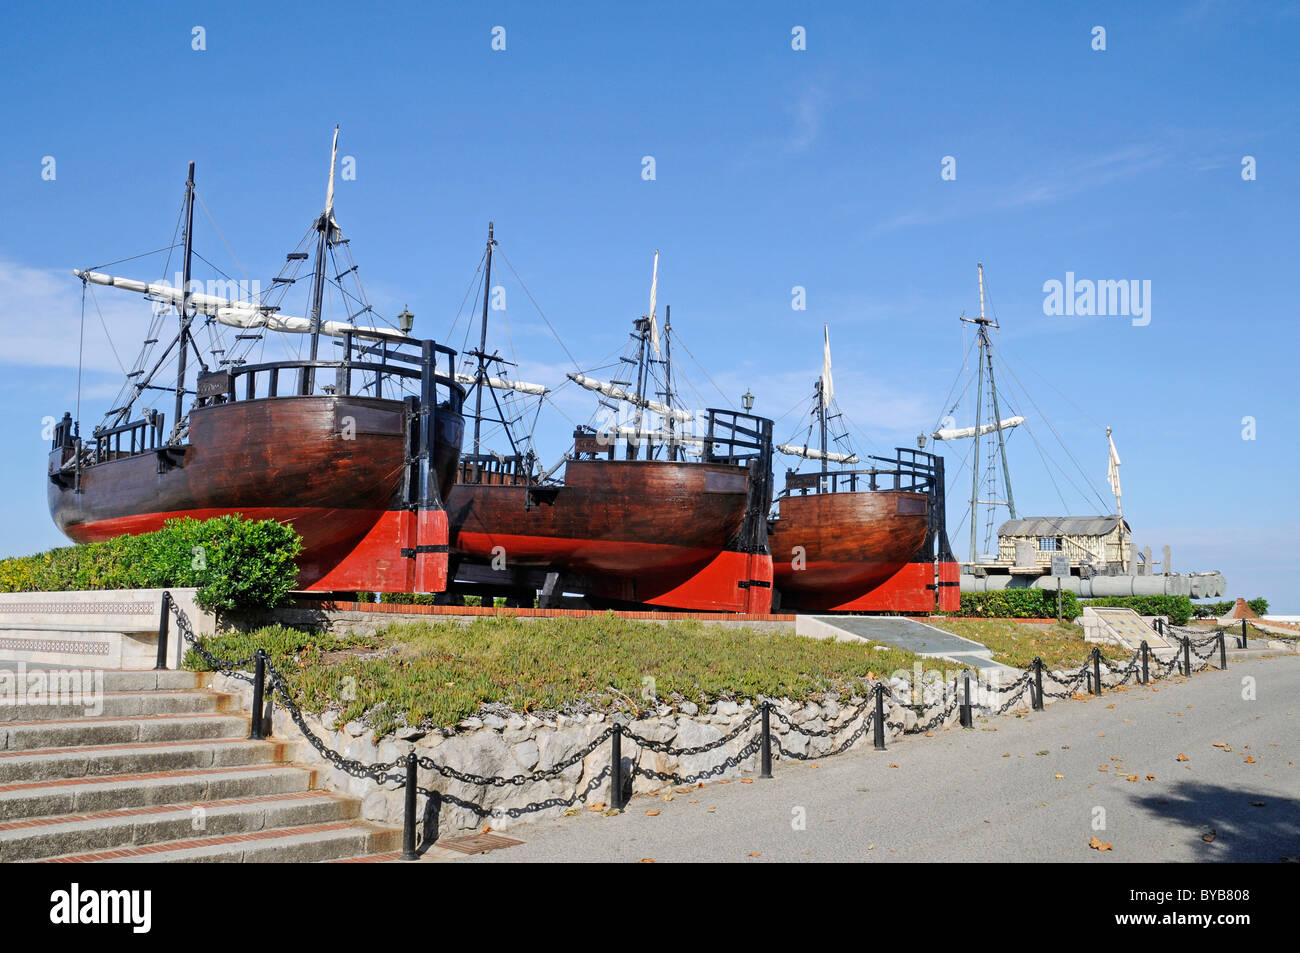 L'homme et la mer, le musée, les navires anciens, la péninsule de Magdalena, Santander, Cantabria, Photo Stock